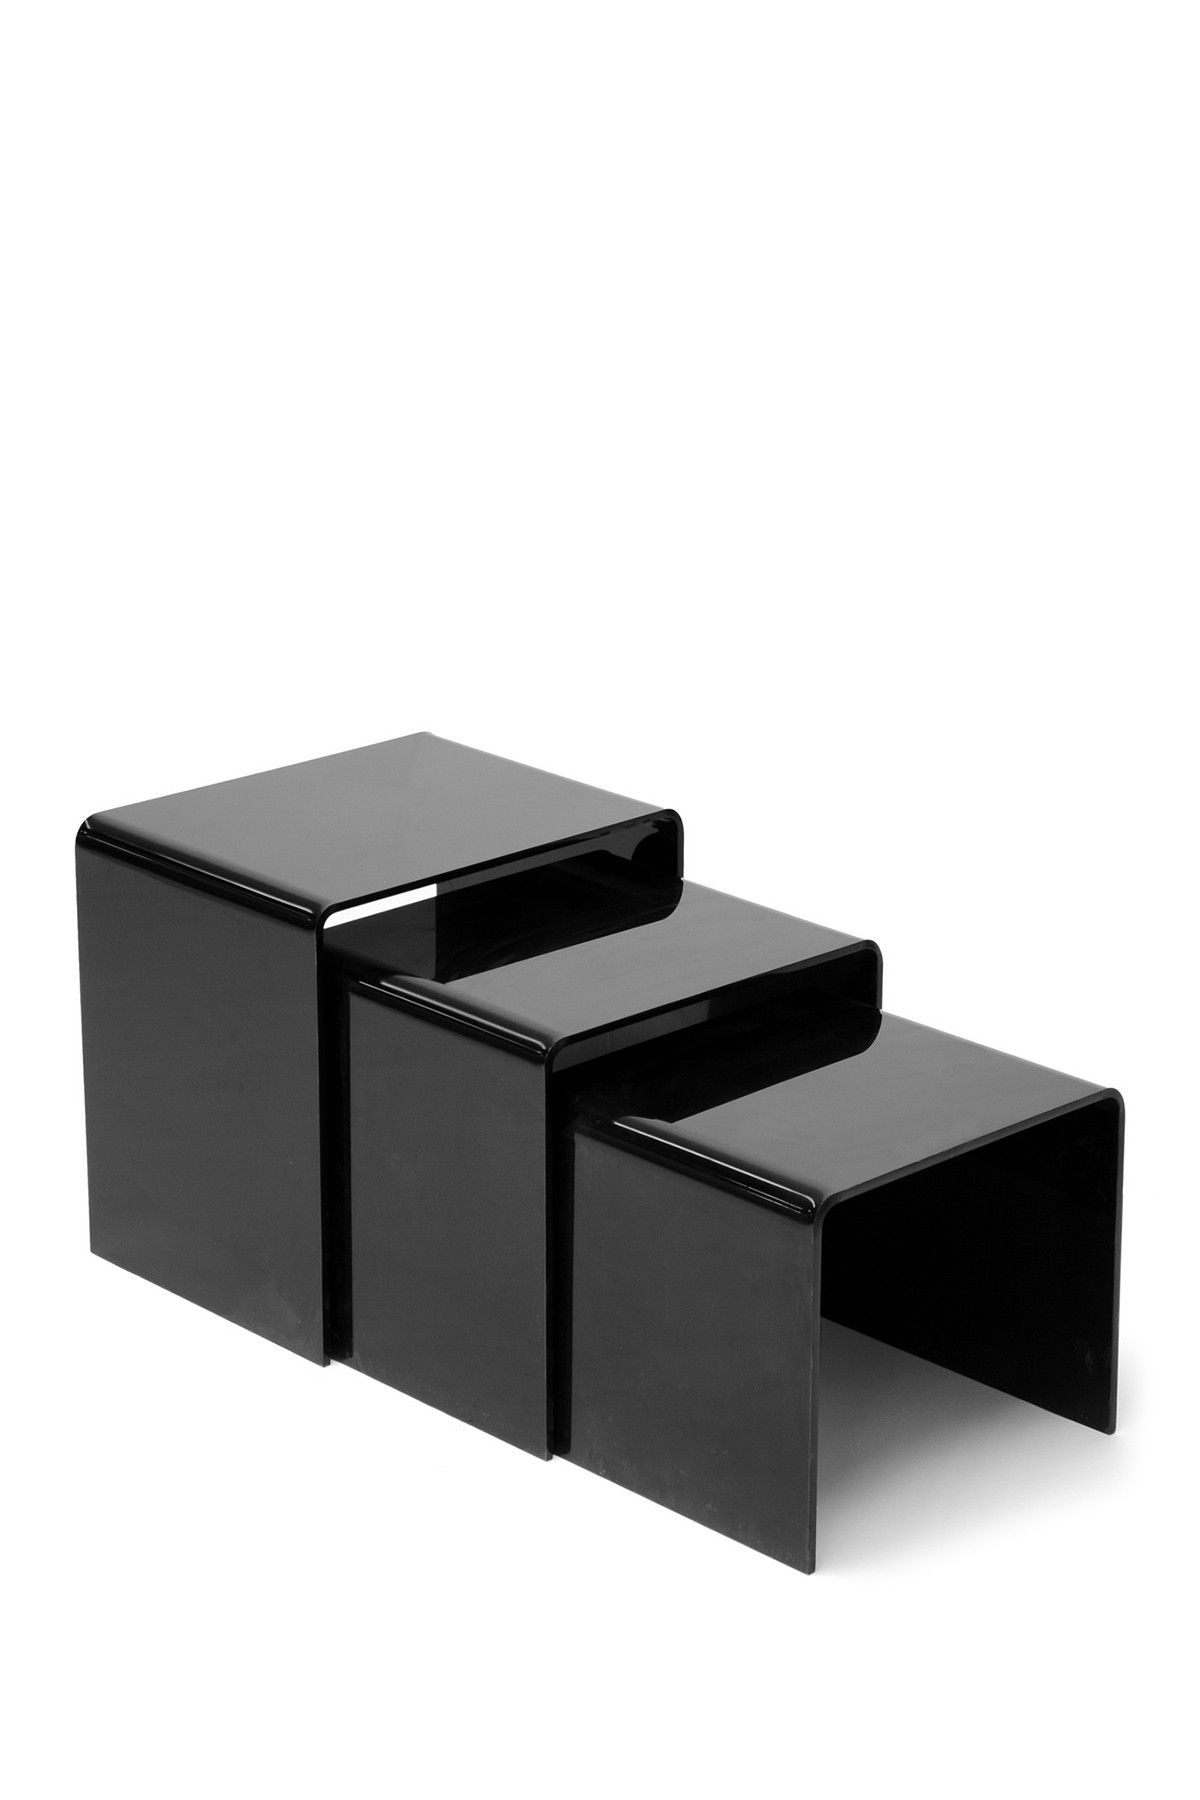 Wholesale interiors mercutio black acrylic nesting table set set wholesale interiors mercutio black acrylic nesting table set set of 3 at nordstrom rack watchthetrailerfo